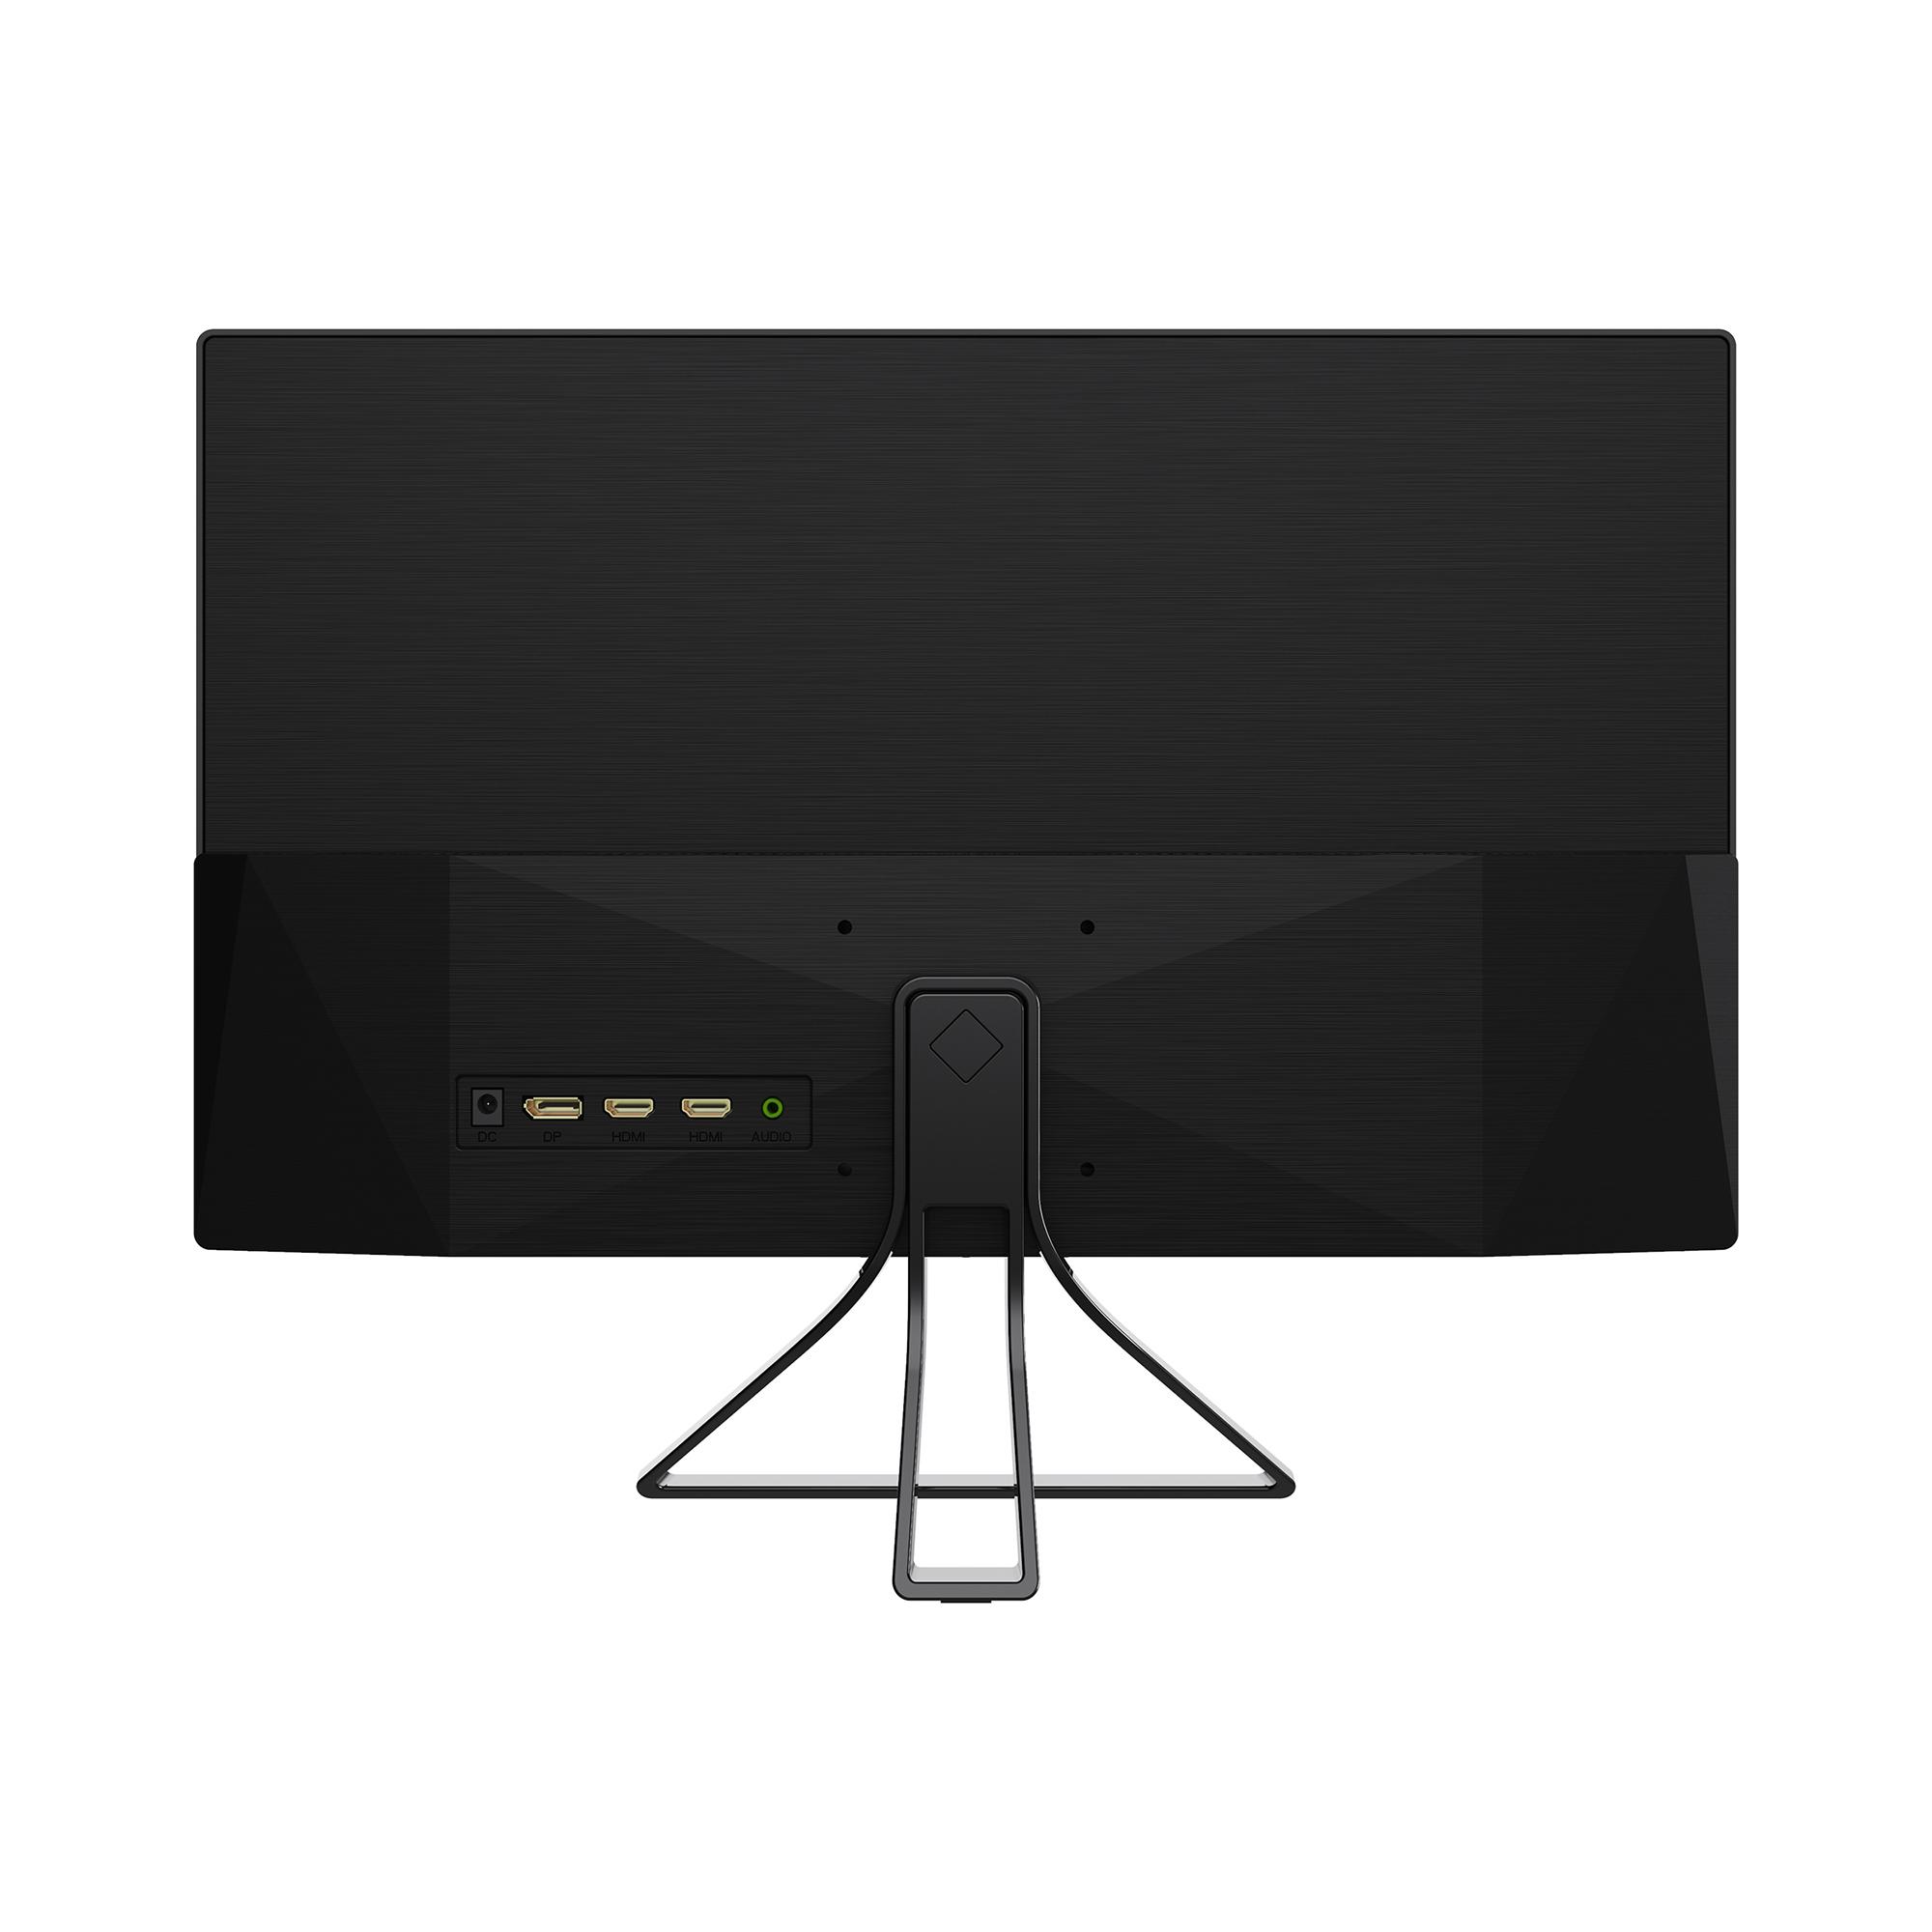 Gfv22cb 22 144hz Gaming Monitor Fhd 5ms Freesync G Sync Ready Vesa Viotek